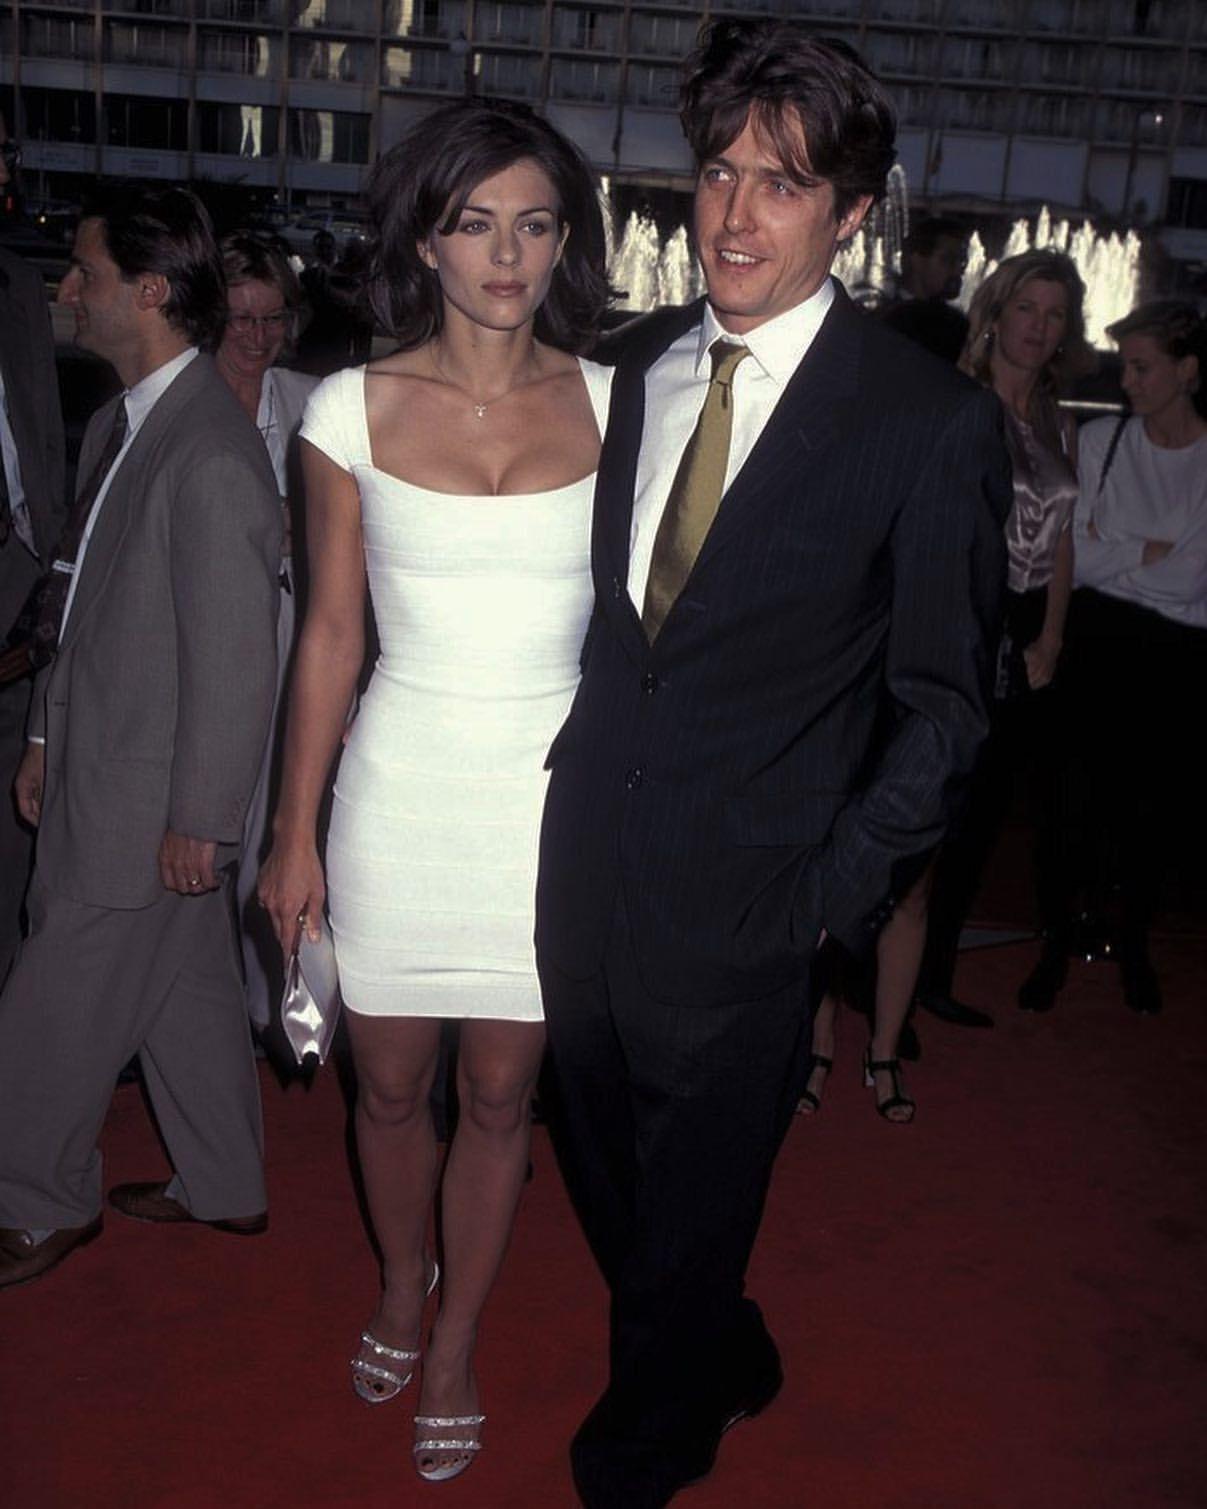 Pin By Sedona On Hugh Grant In 2020 Hugh Grant Elizabeth Hurley Hot Couples